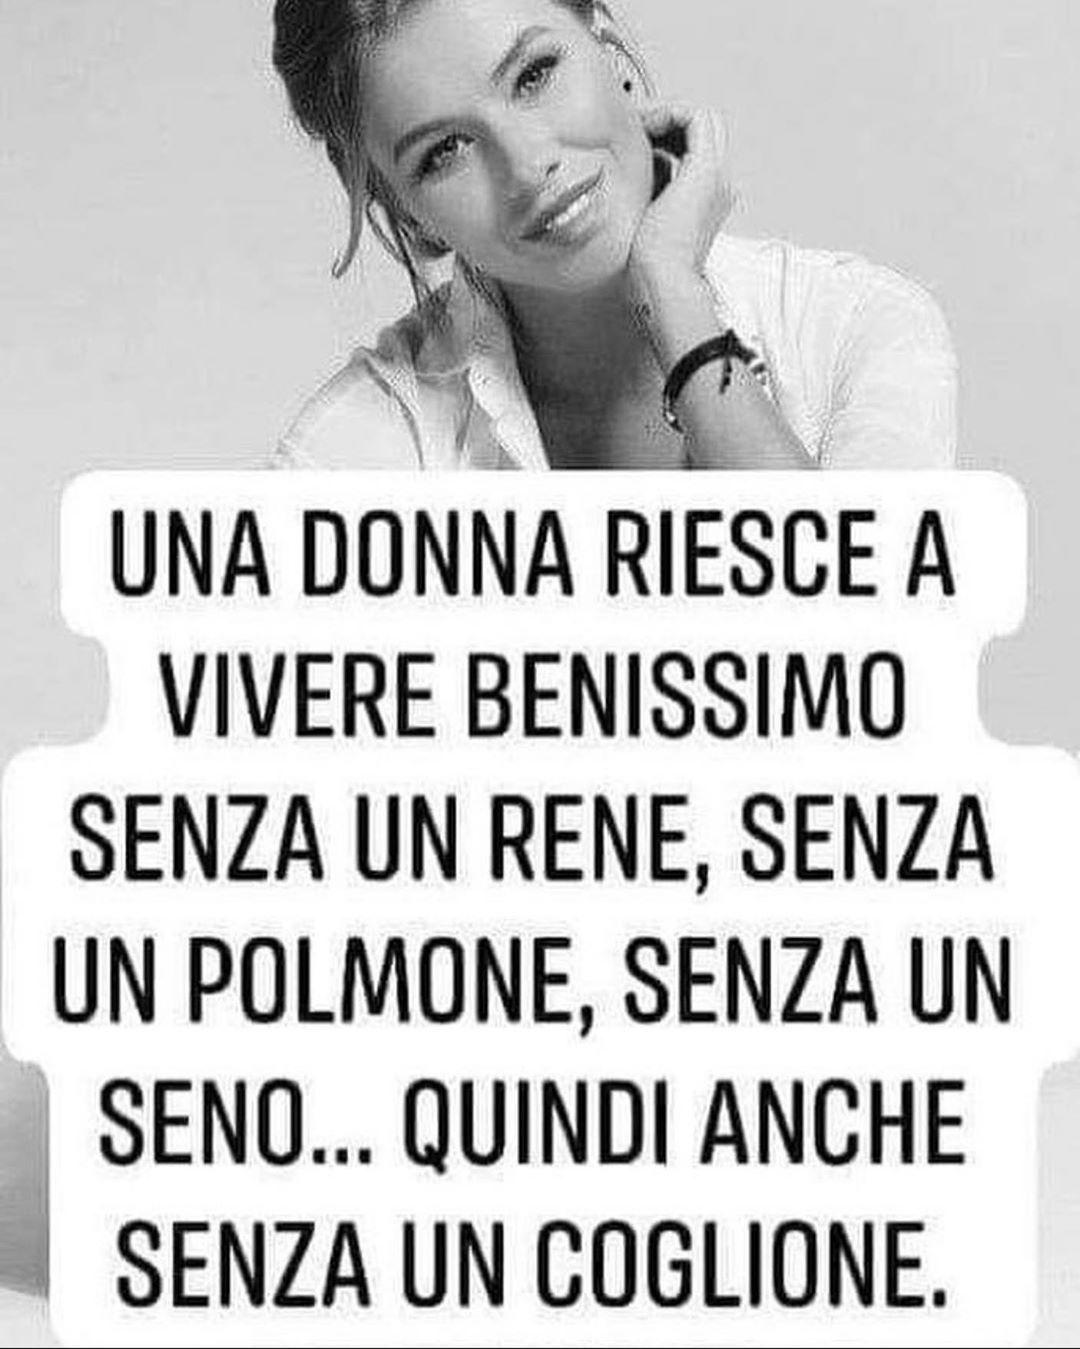 "La Bastarda on Instagram: ""Buongiorno..  - - - - - #frasi #frase #frasiitaliane #citazioni #citazione #pensieri #aforismi #italia #frasitumblr #amore #frasidivertenti…"""